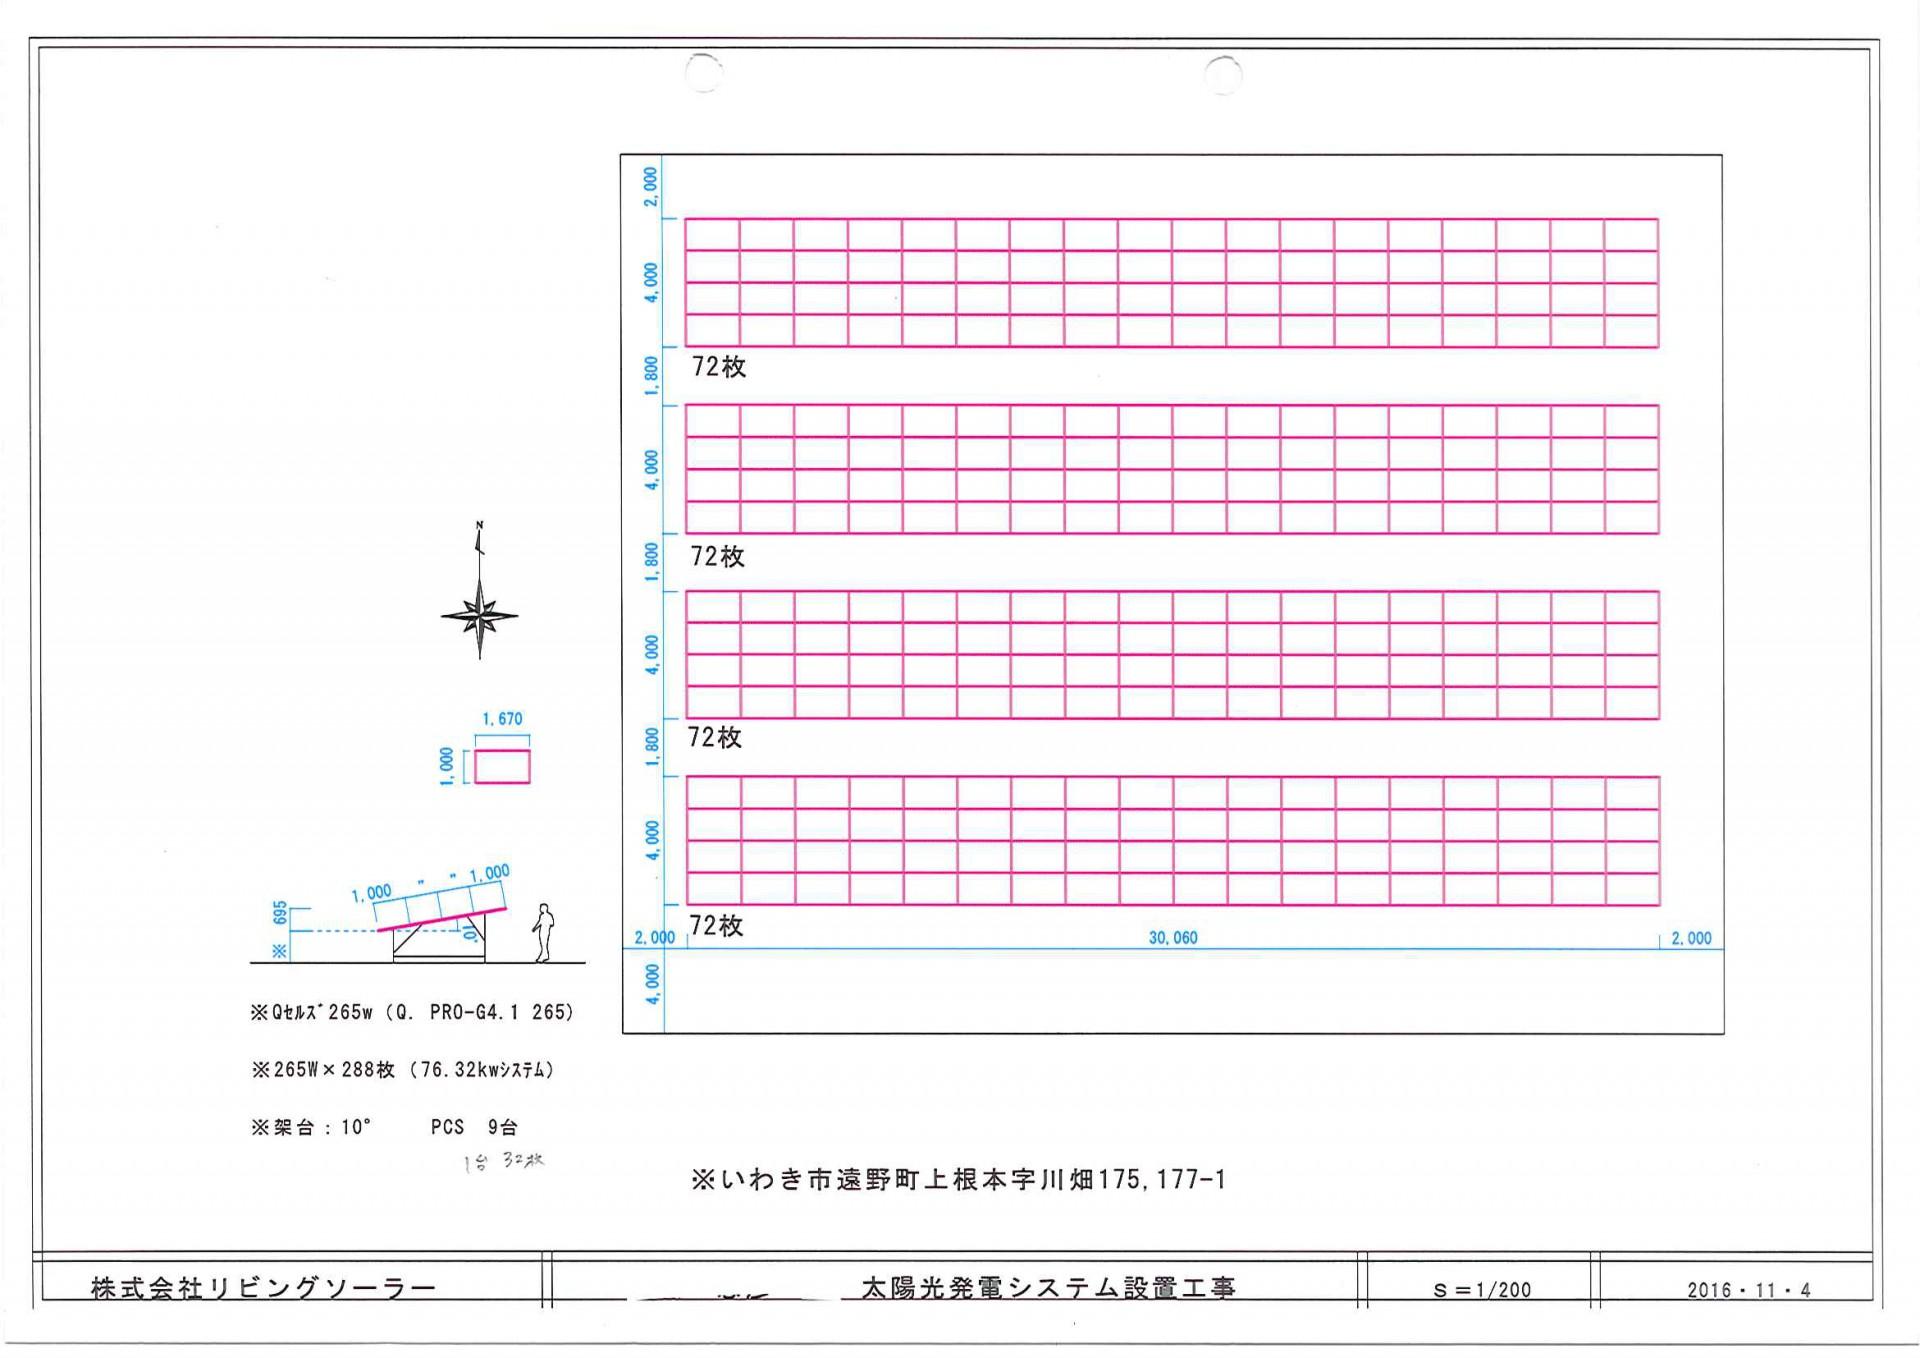 【LS】FIT24円 福島県いわき⑧発電所のメイン画像